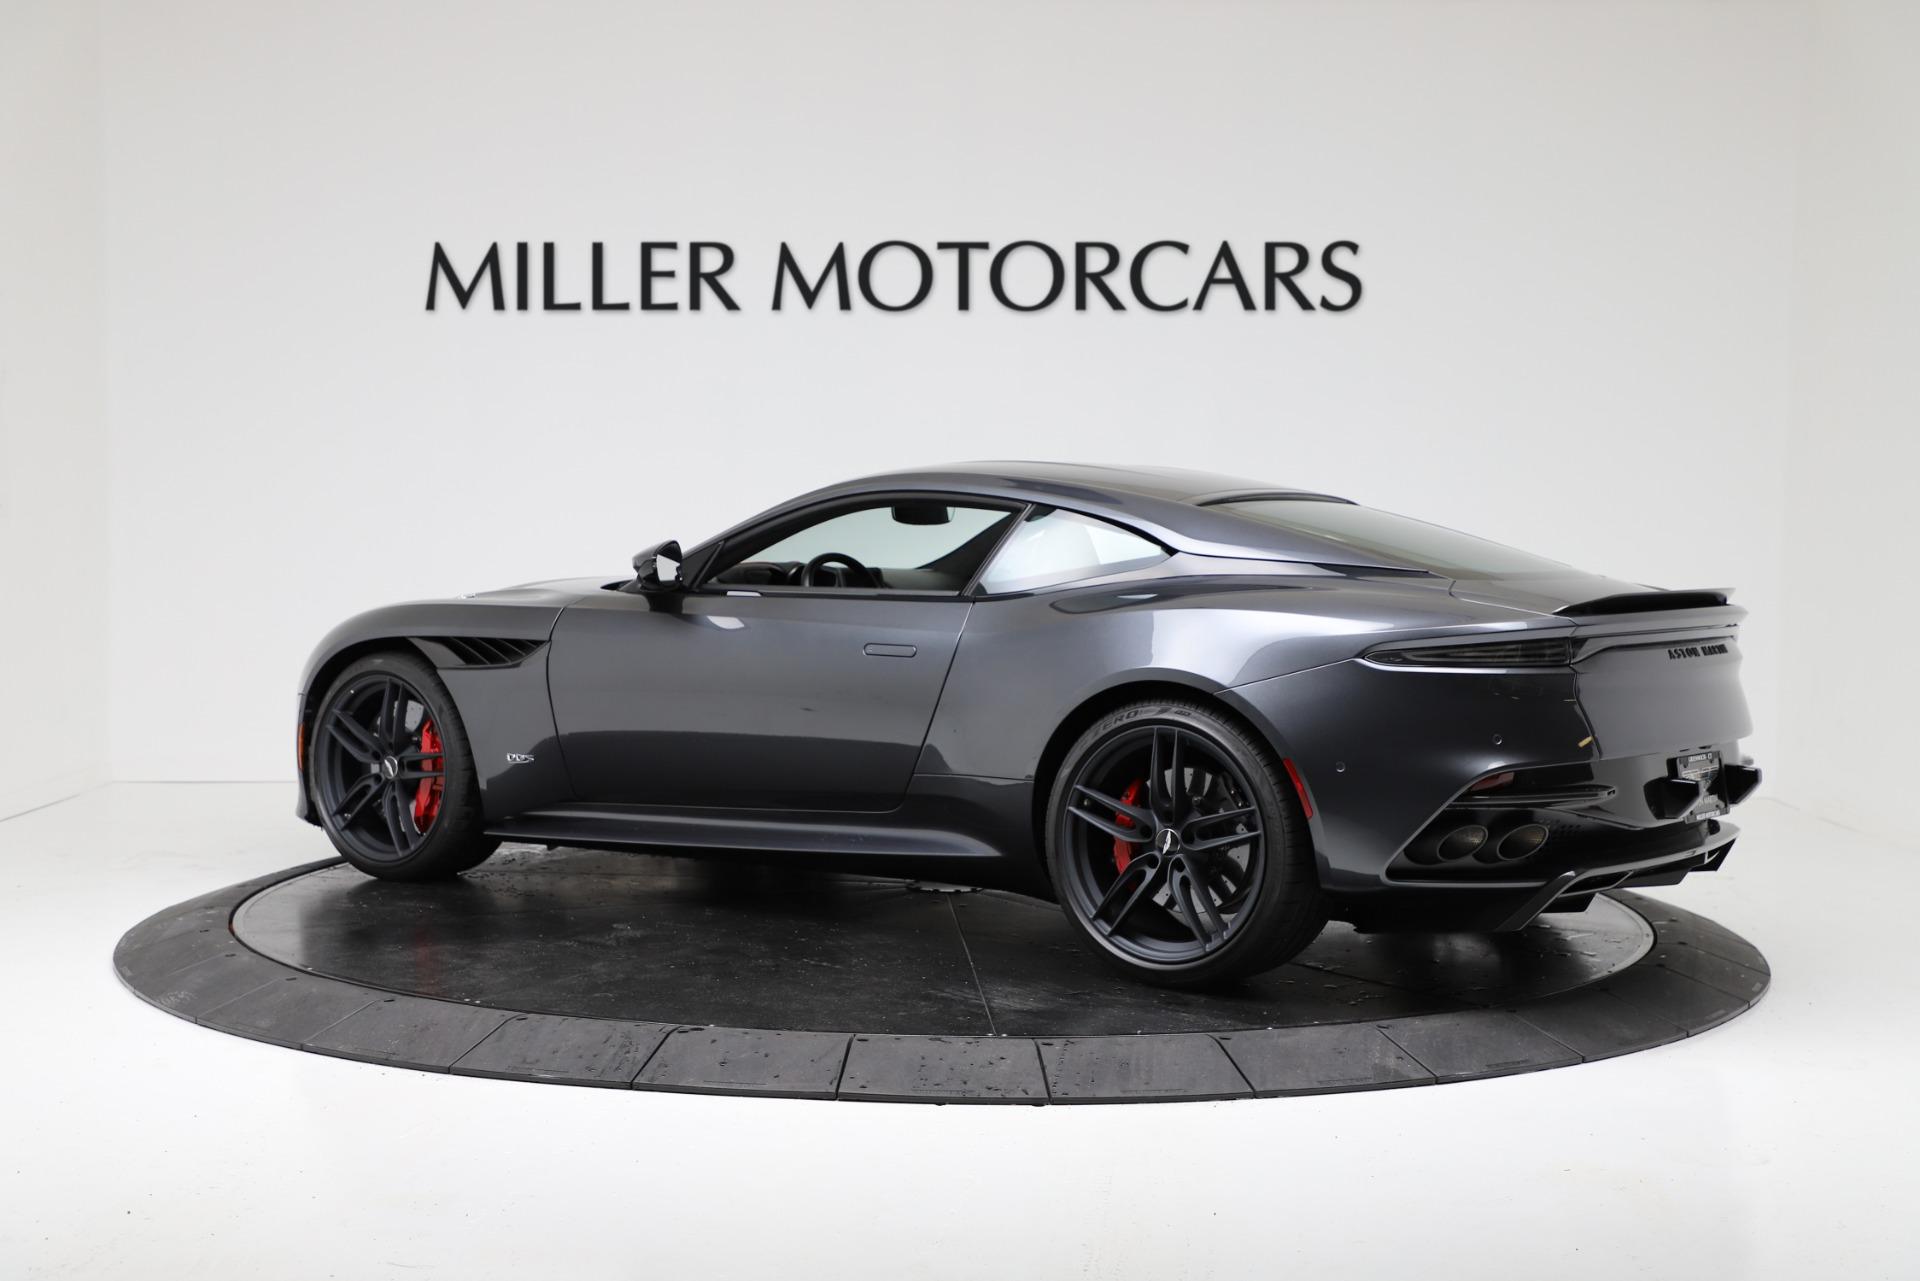 New 2019 Aston Martin DBS Superleggera For Sale In Greenwich, CT 3318_p4